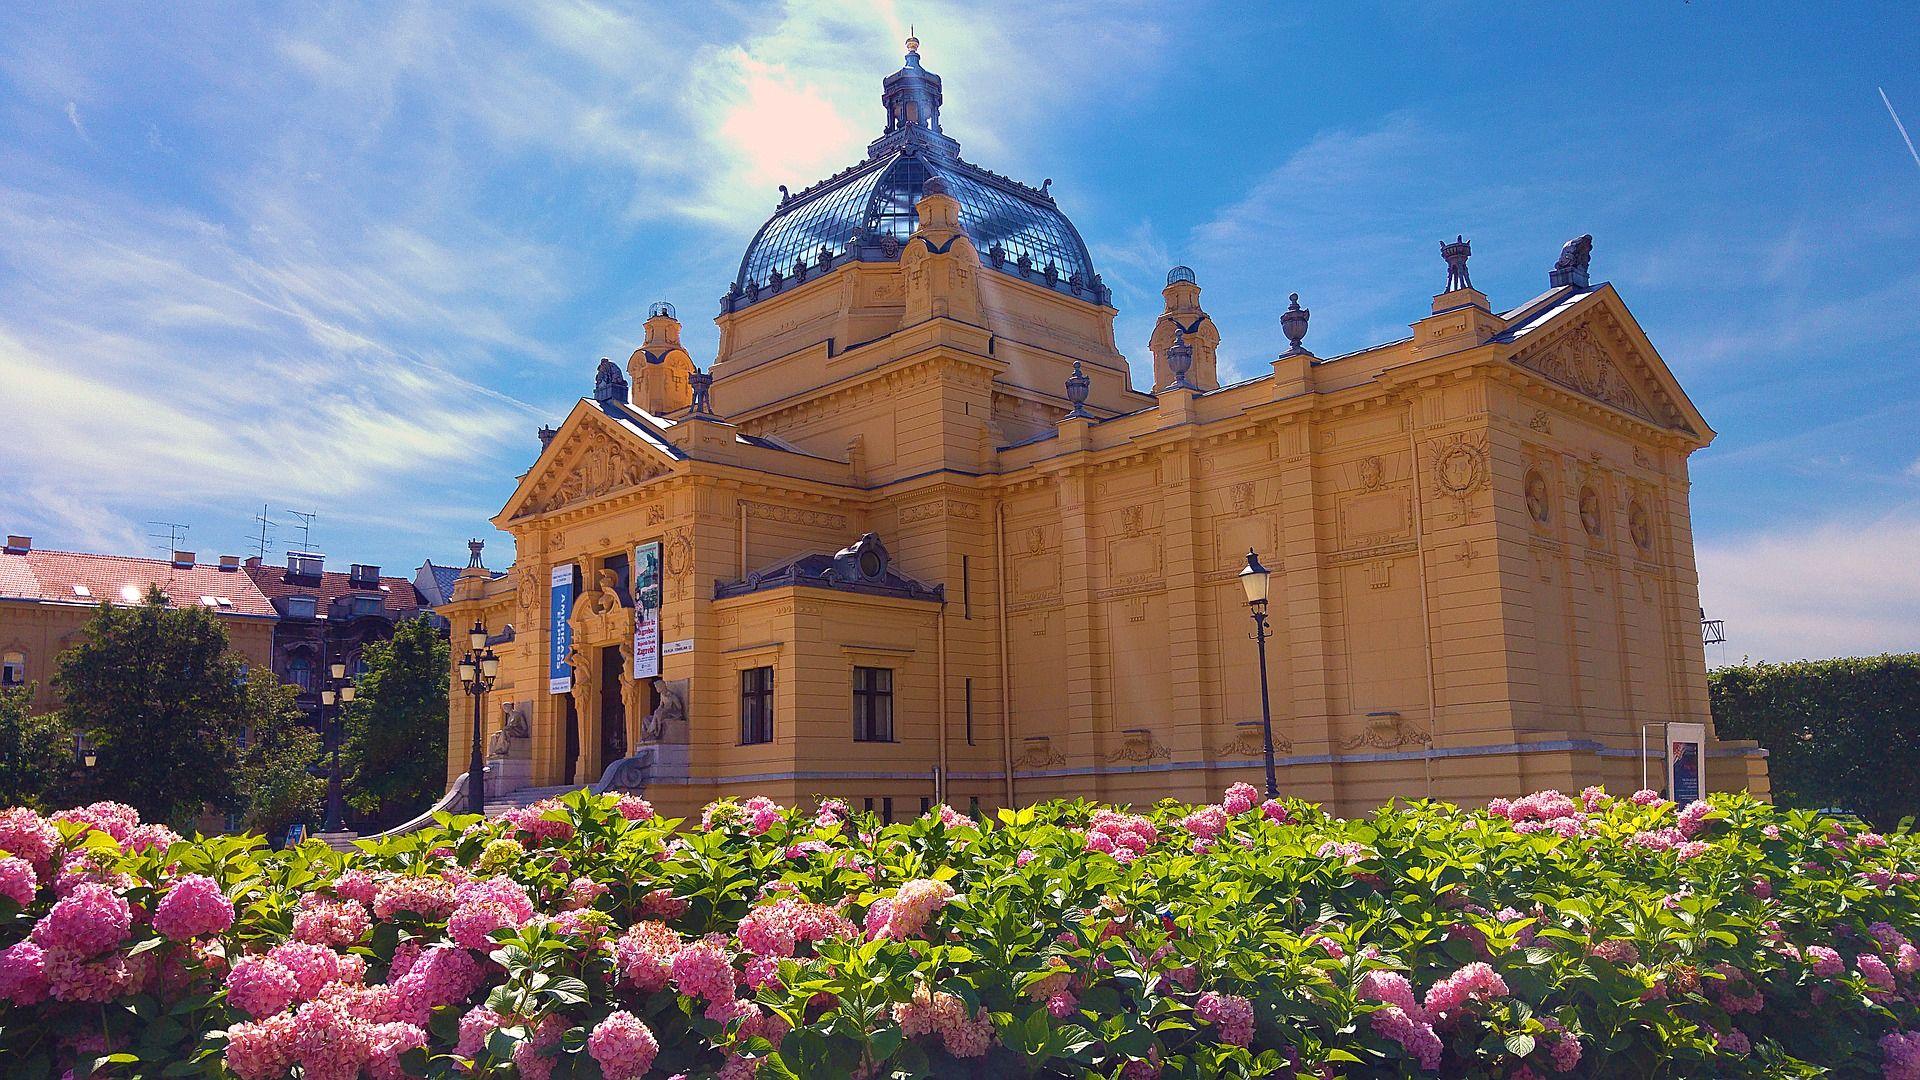 Zagreb 8 Top Tourist Attractions In Croatia Travel Mind Map Bookomap Croatia Croatia Travel Instagrammable Places